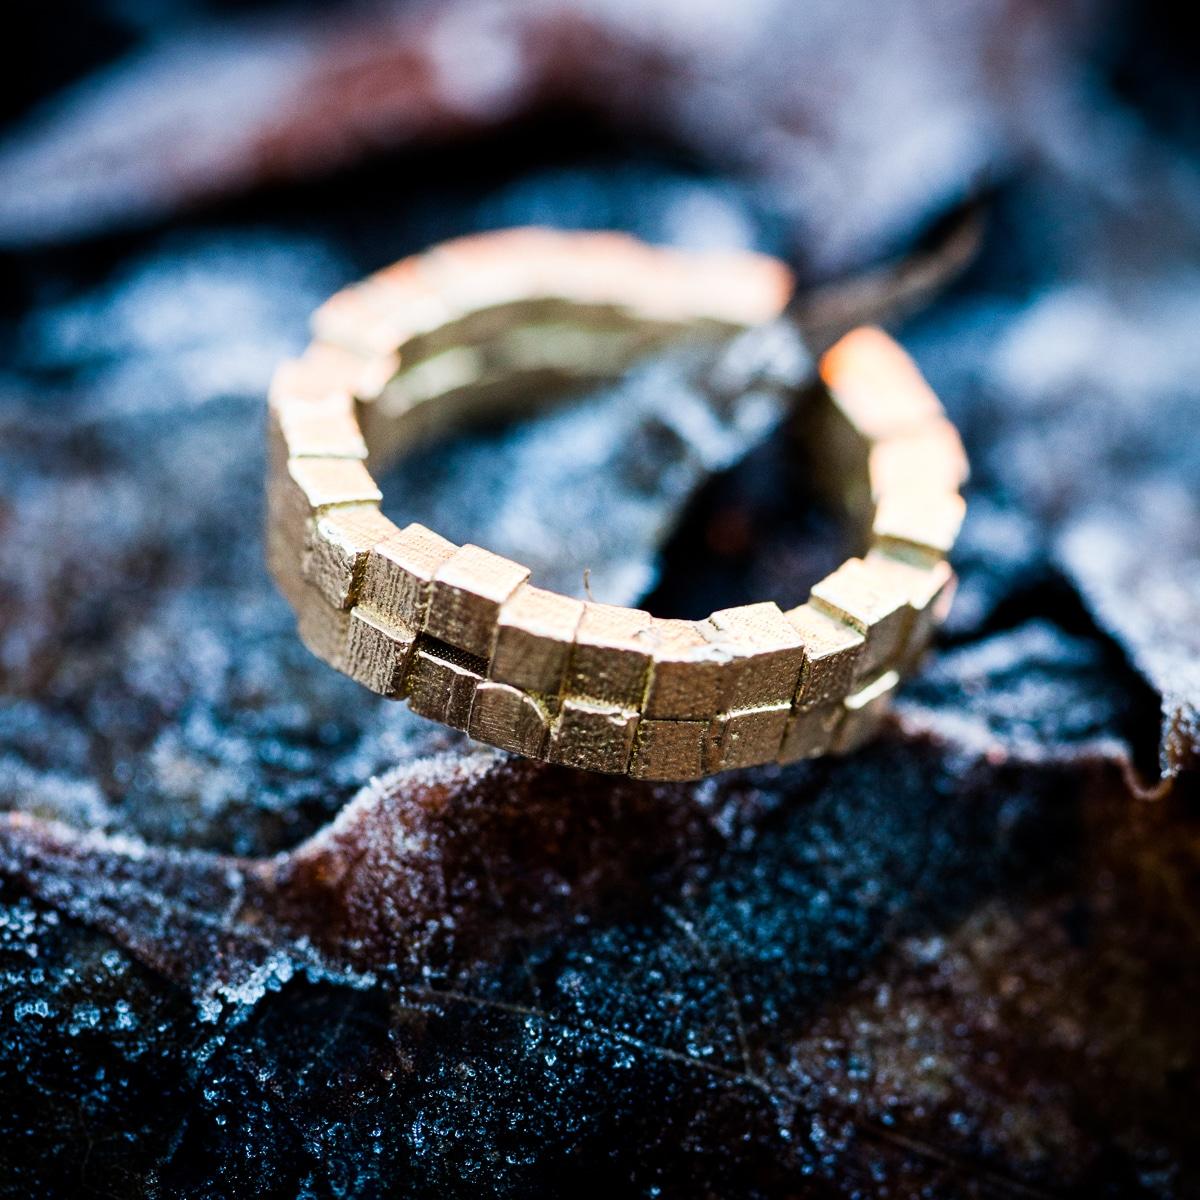 Cubii-ring-2.2-mini-raw-bronze-3